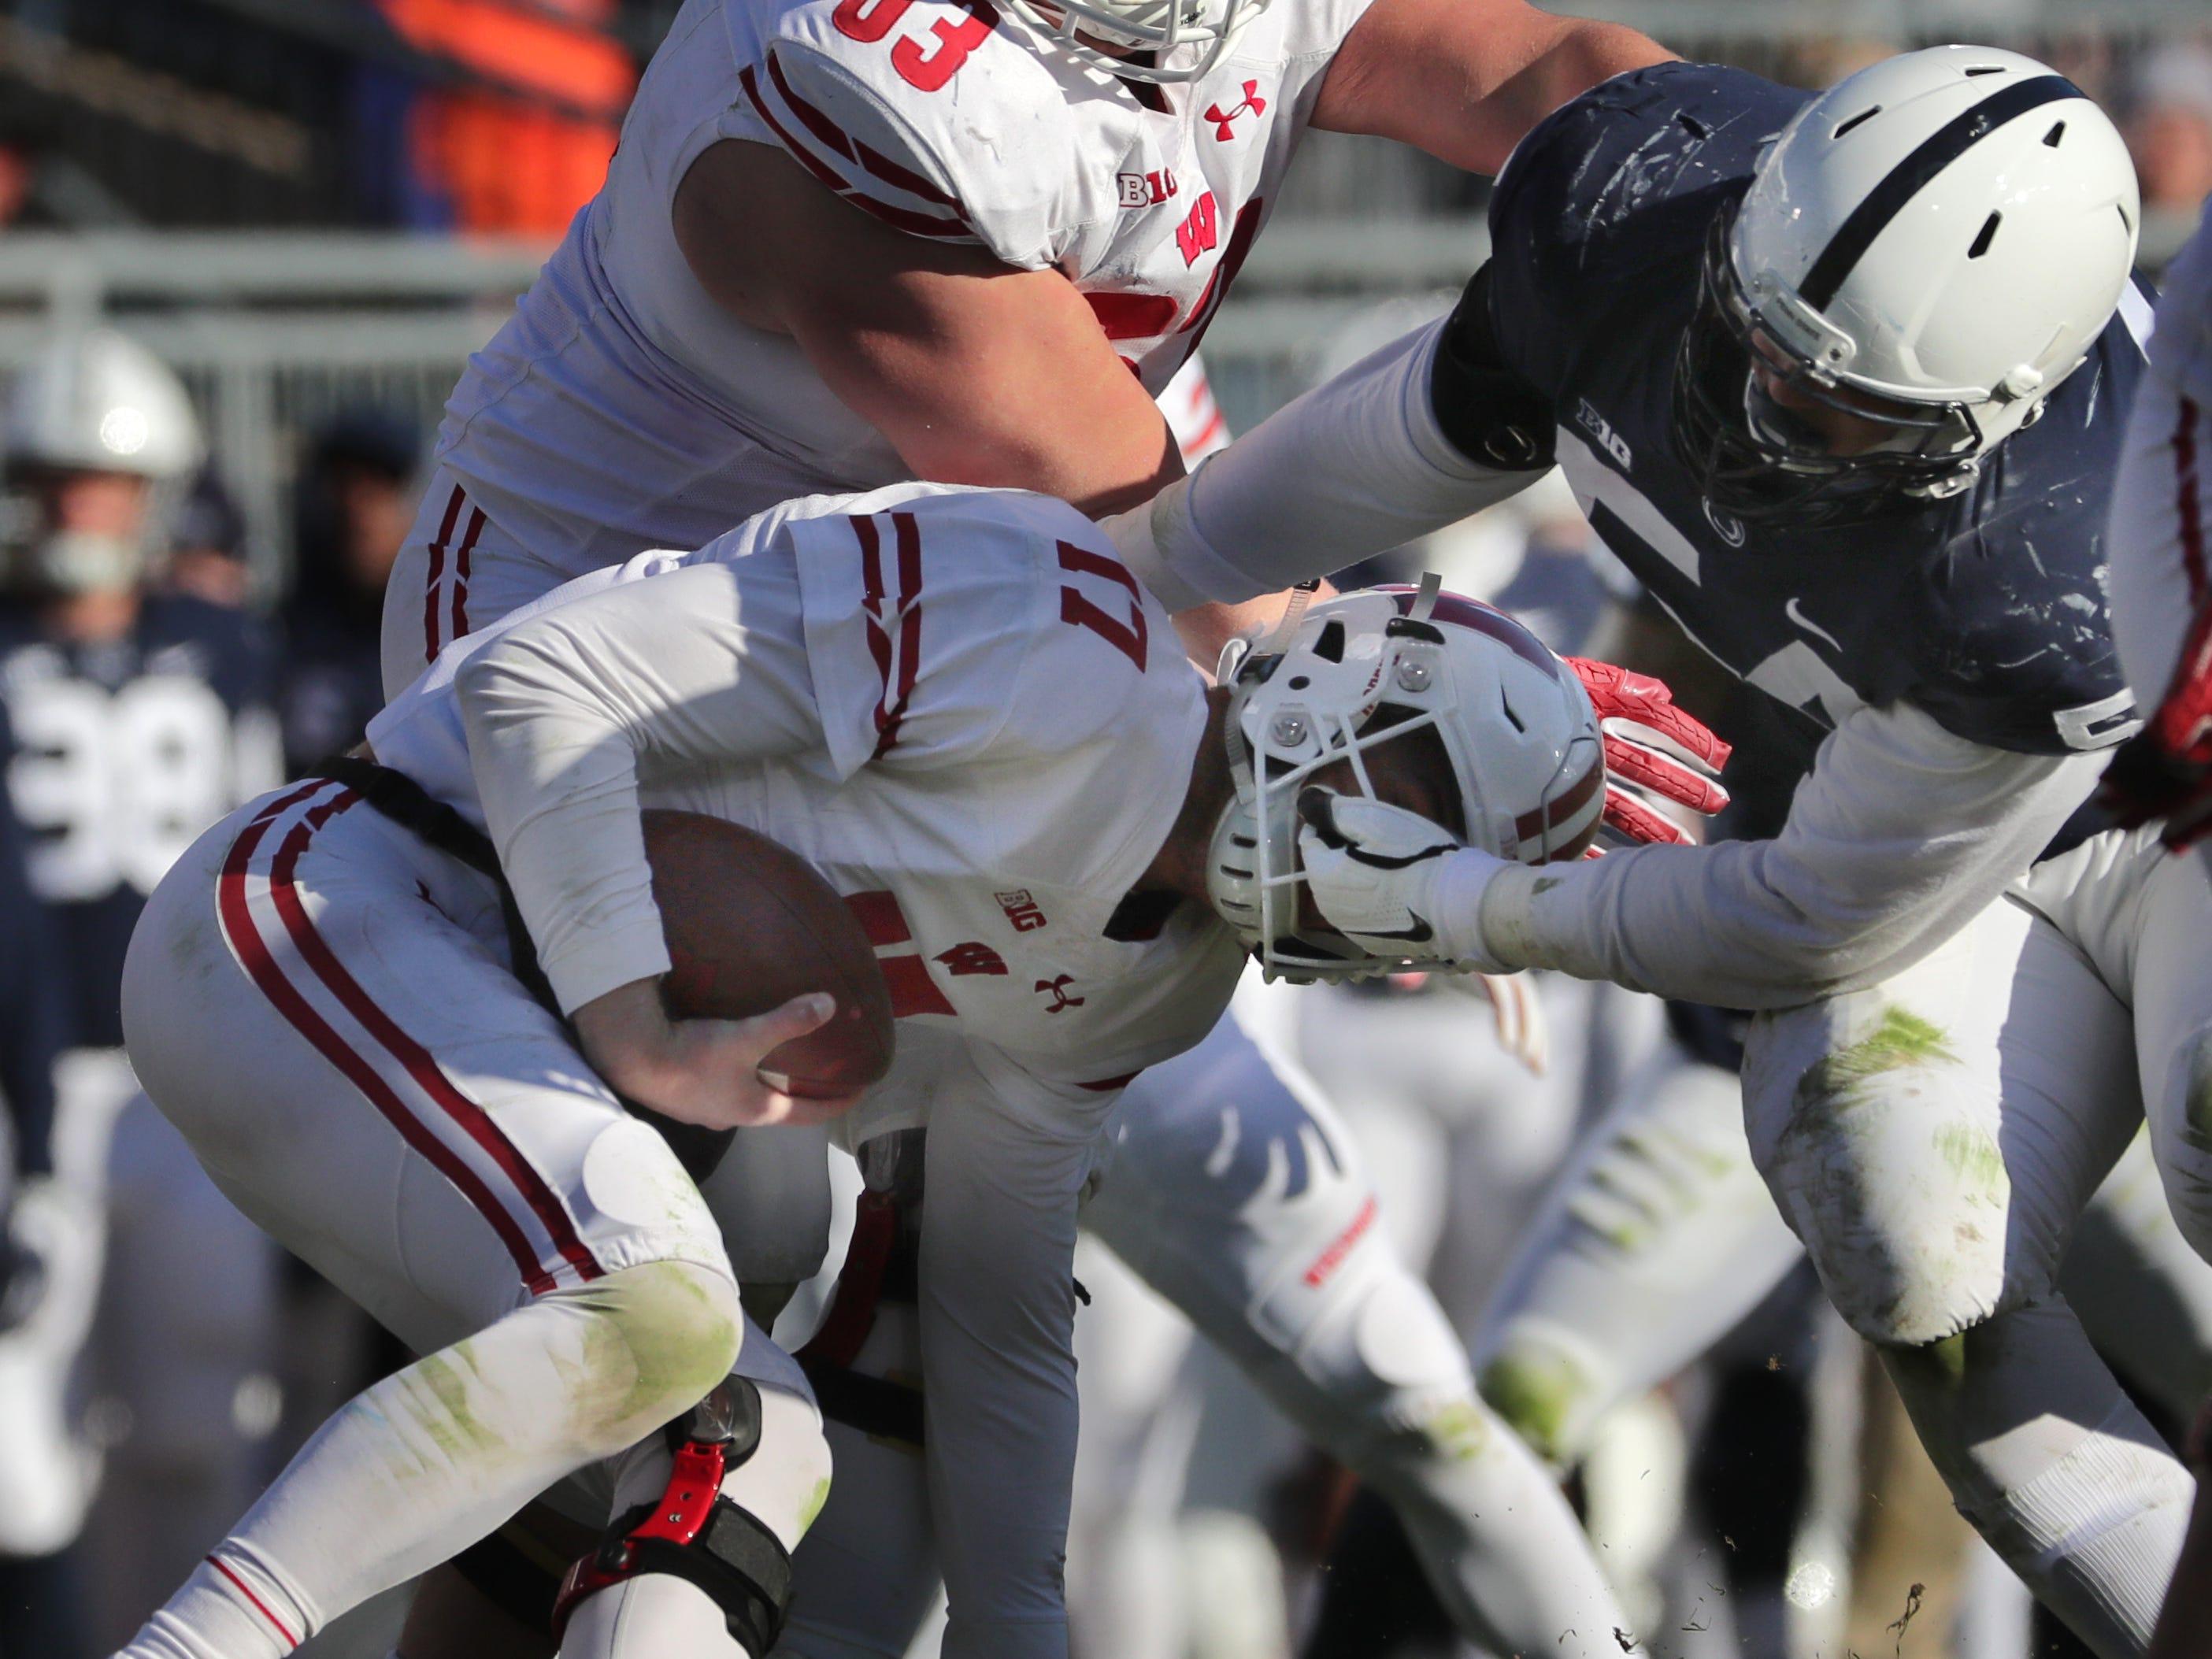 Penn State defensive tackle Robert Windsor grabs some face mask as he sacks Wisconsin quarterback Jack Coan during the third quarter Saturday.